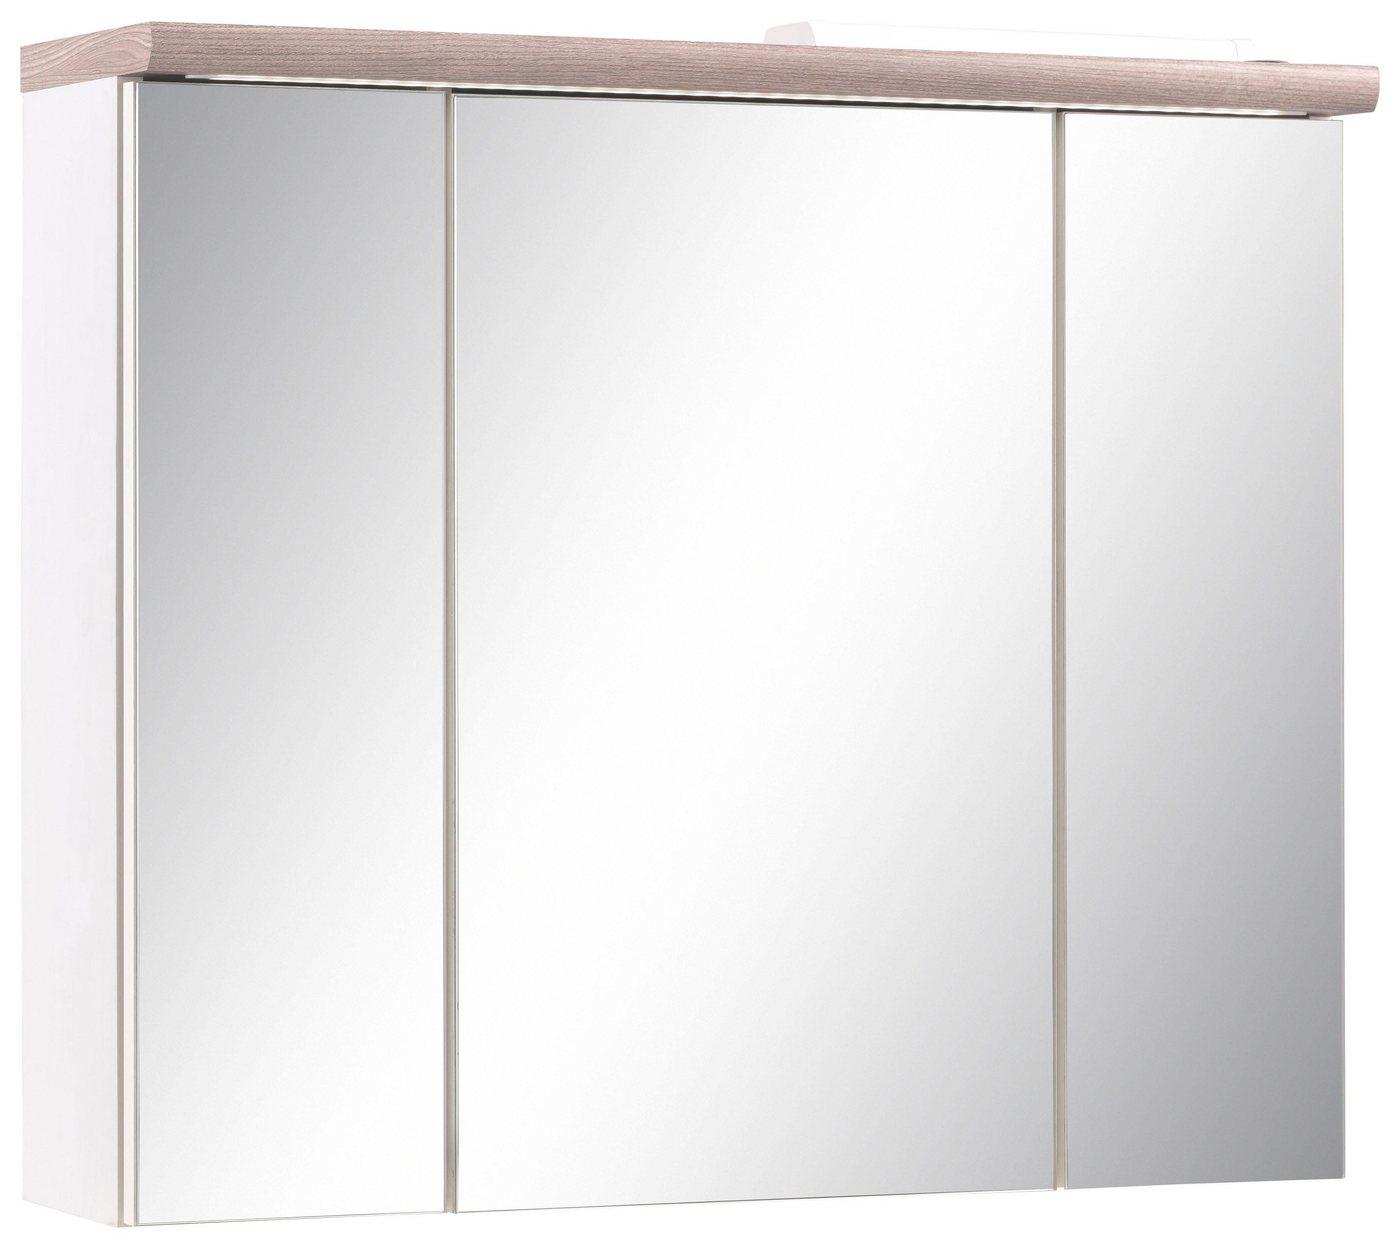 welltime  Spiegelschrank Romantic mit LED Beleuchtung  | 04038889049632